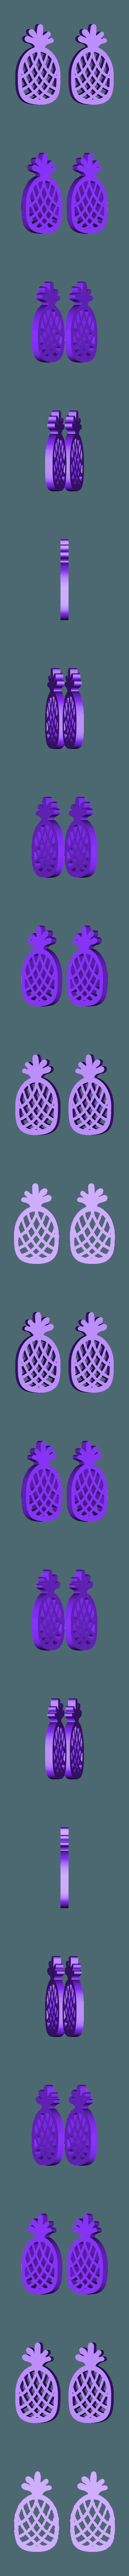 Pinnaple_STL.stl Download free STL file Pinnaple time • 3D printer design, Isi8Bit